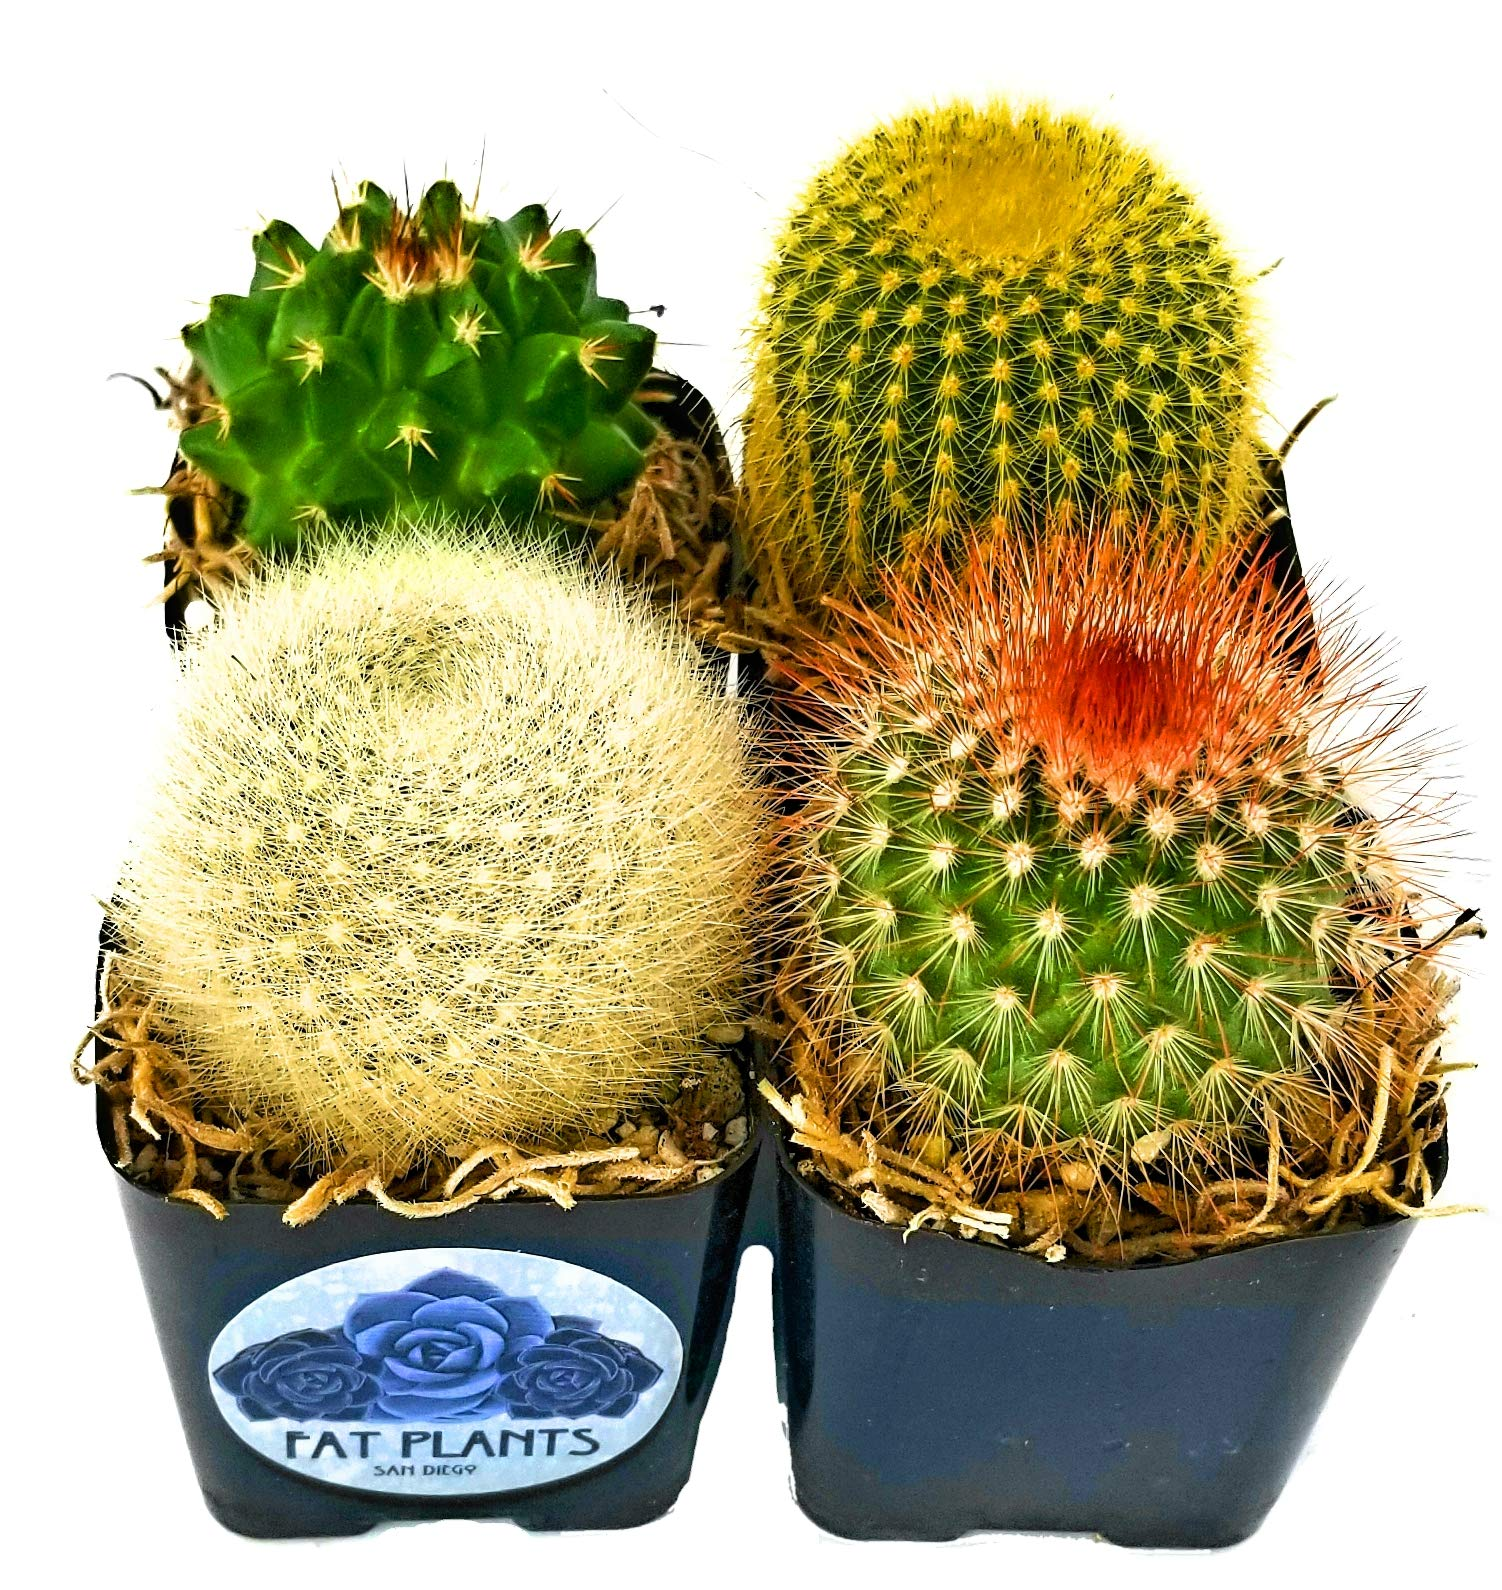 Fat Plants San Diego Mini Cactus Plants in Plastic Planters by Fat Plants San Diego